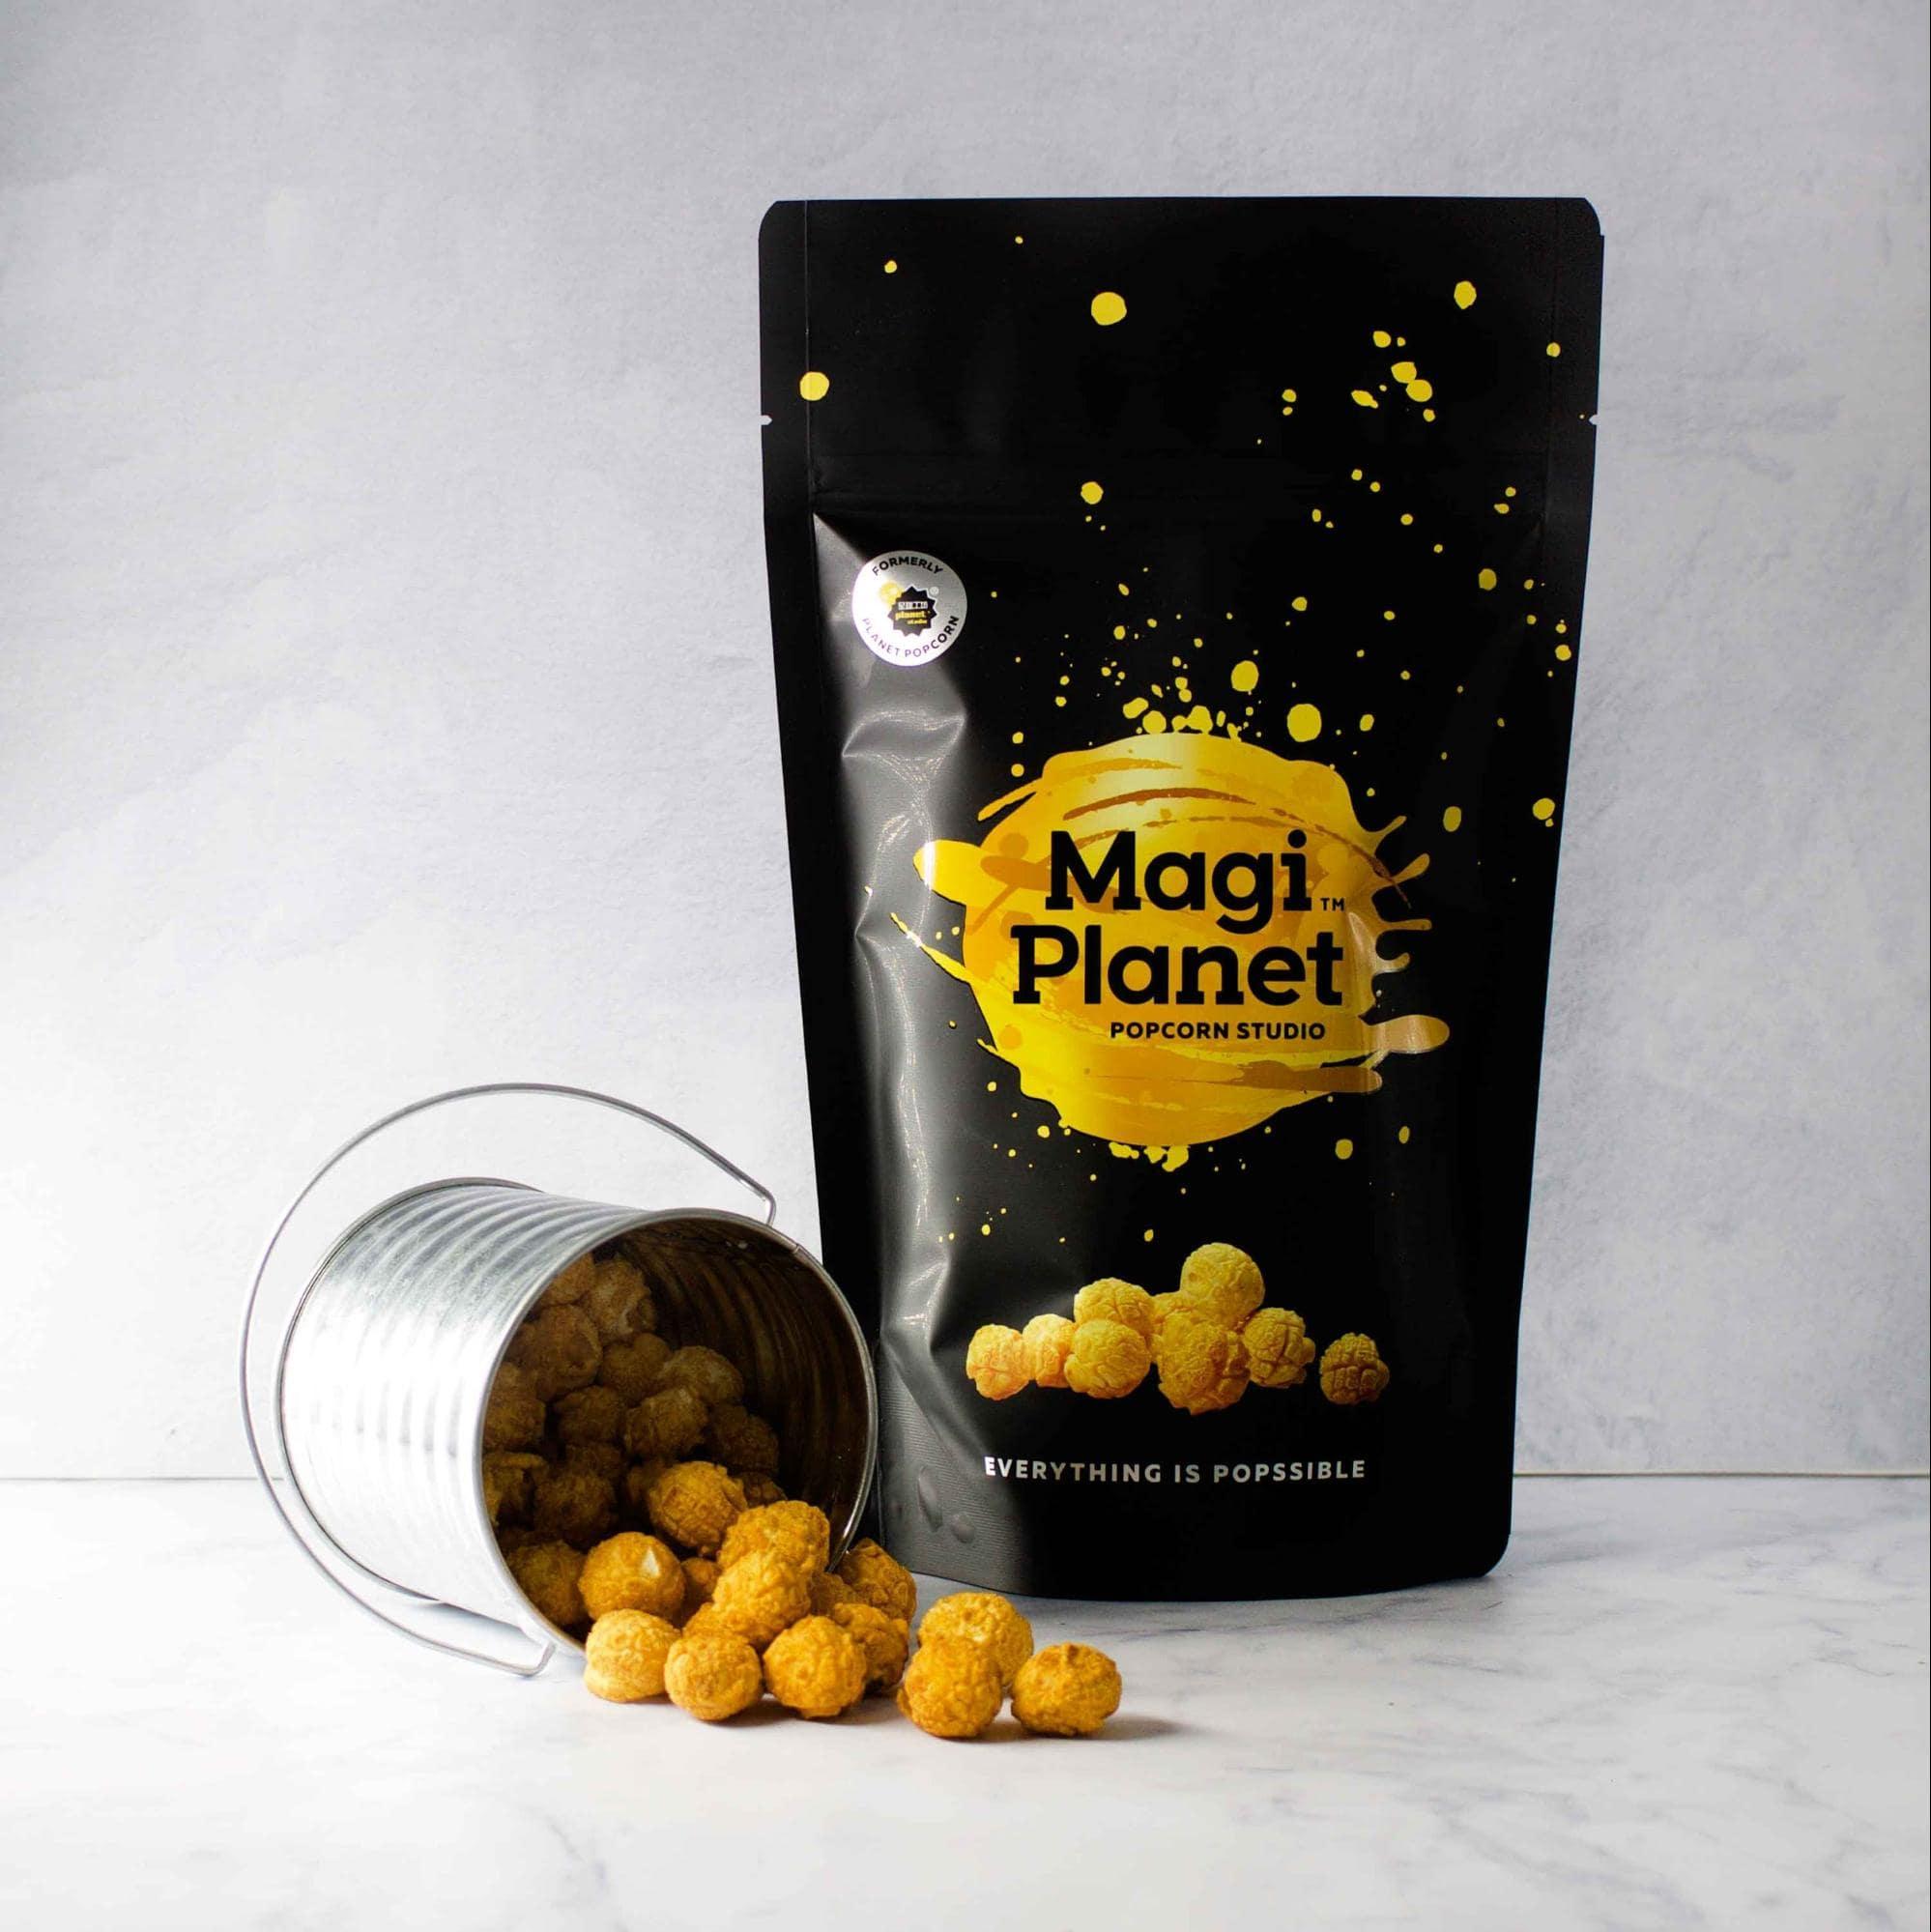 Ma La Snacks - Magi Planet's sizzling mala popcorn